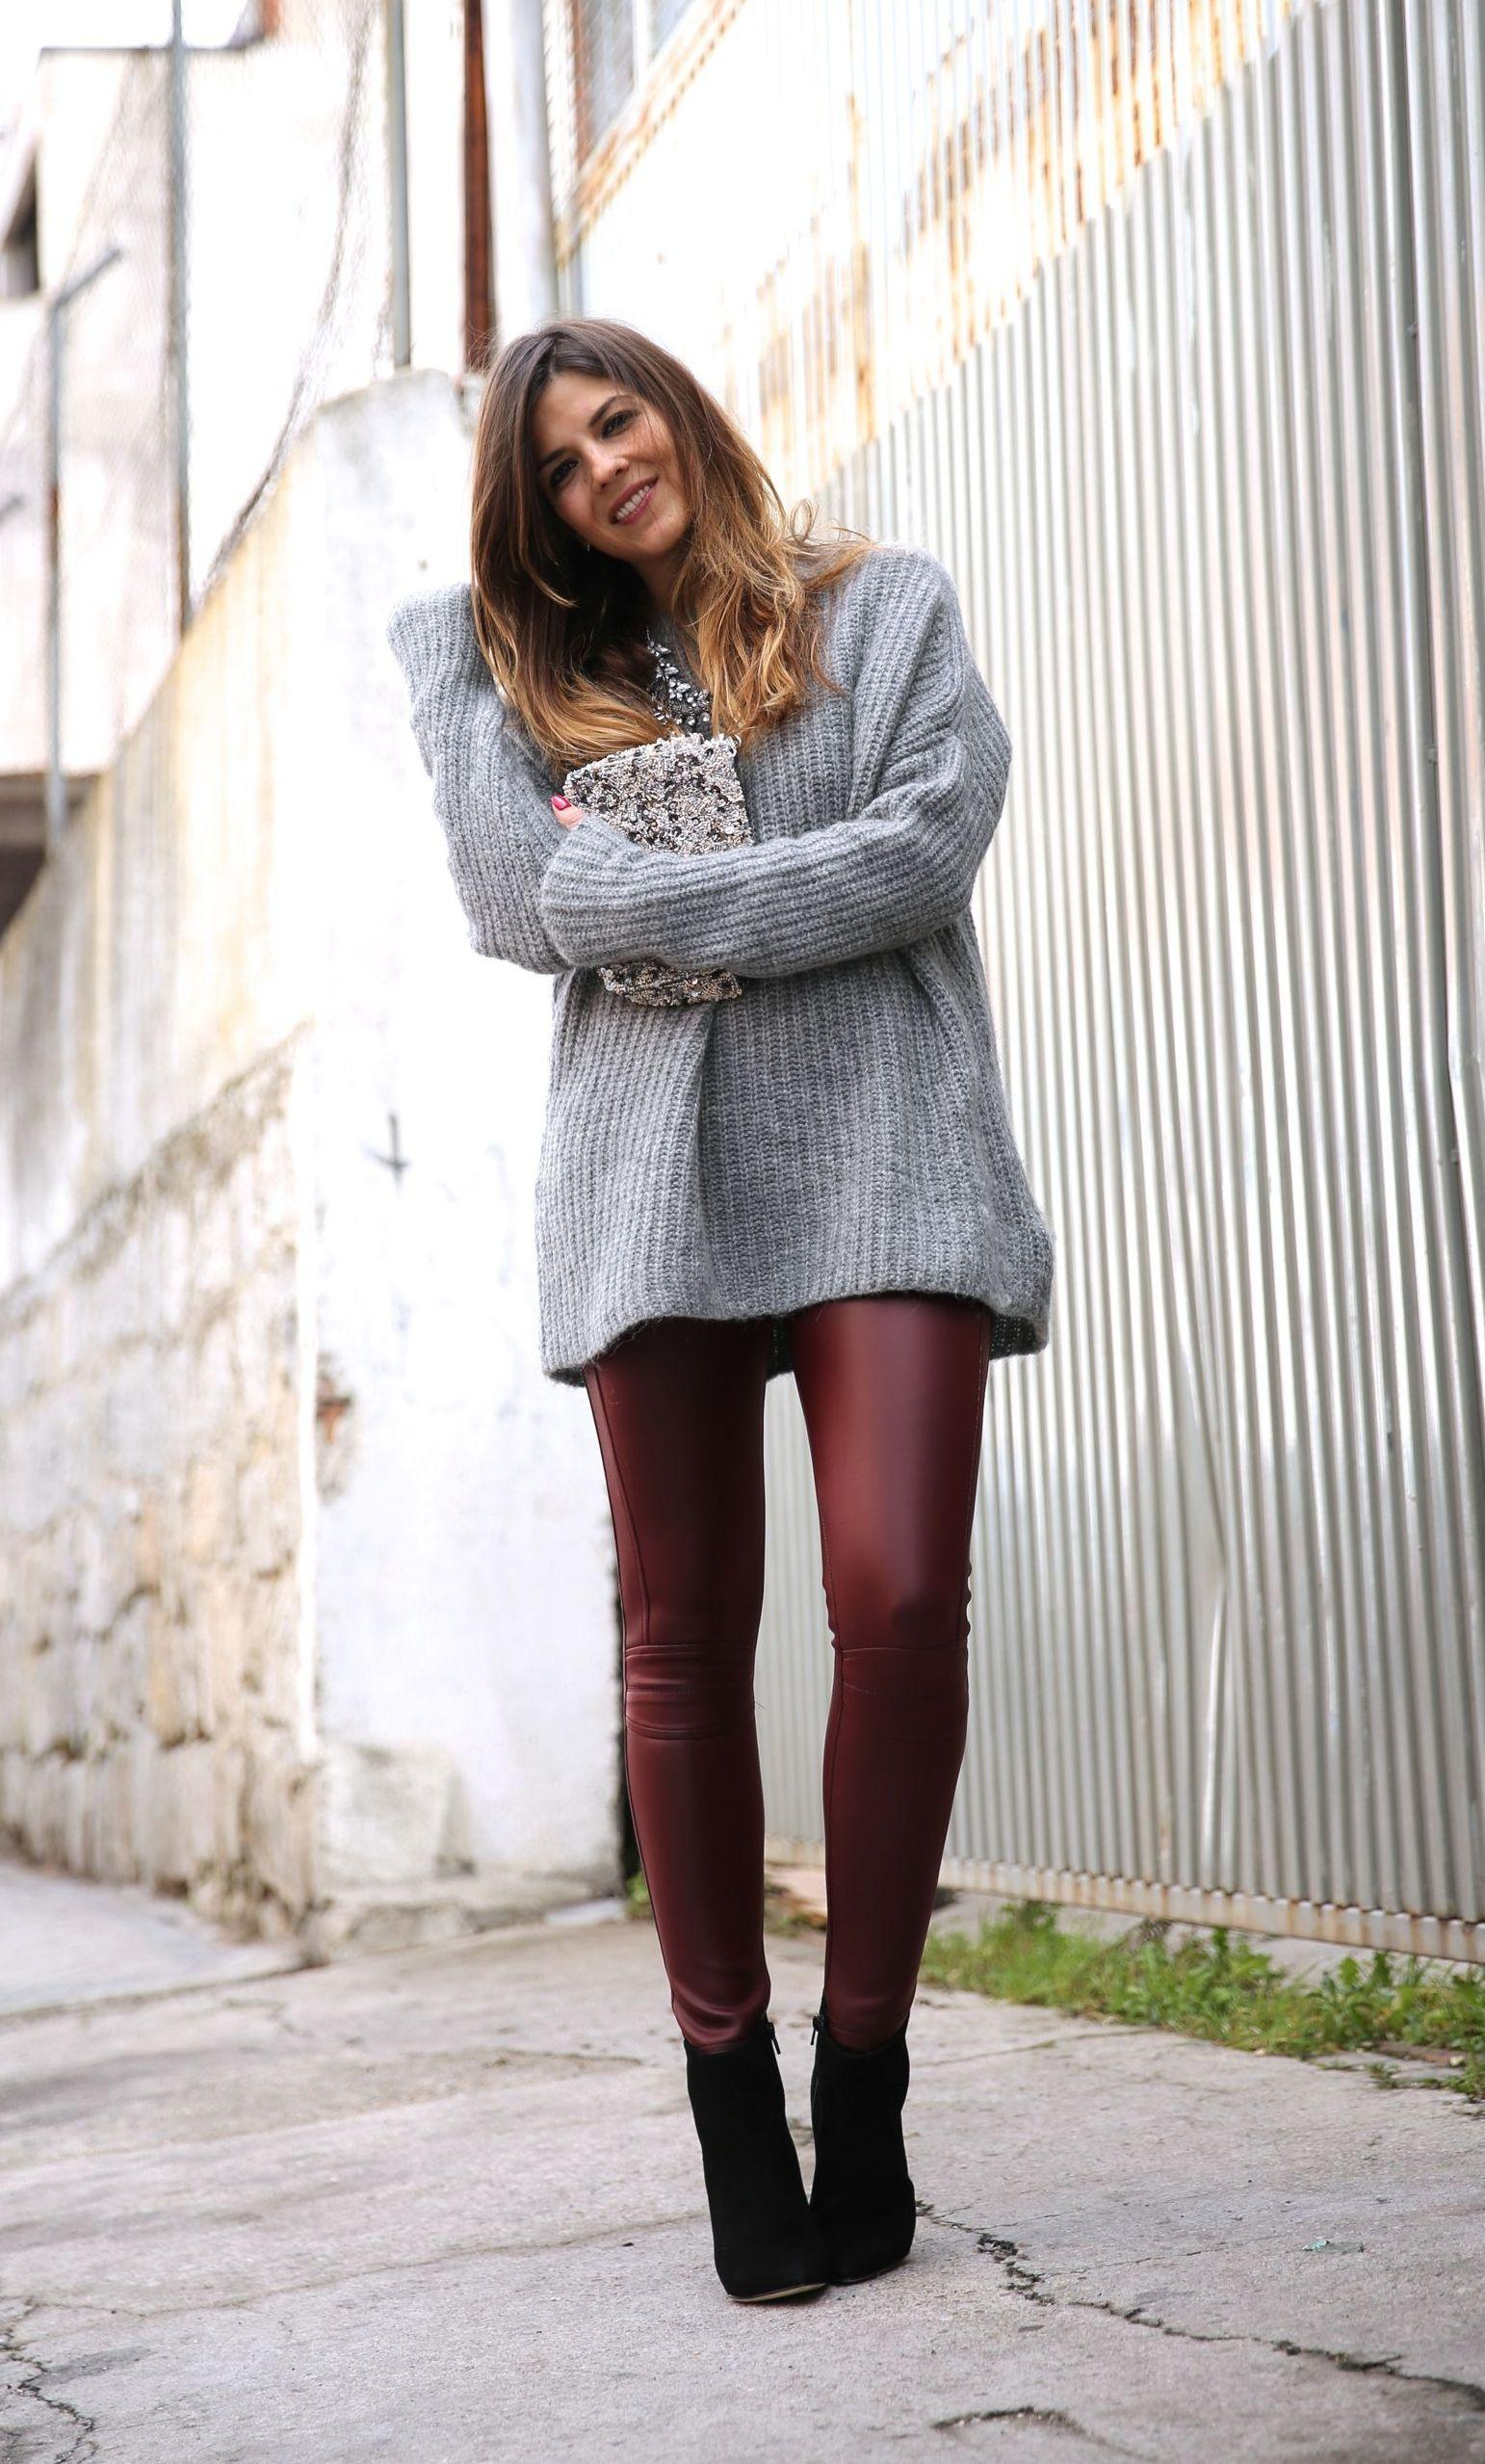 "Foto: Reprodução / <a href=""http://www.trendytaste.com/burgundy-leather-leggings/"" target=""_blank"">Trendy Taste</a>"